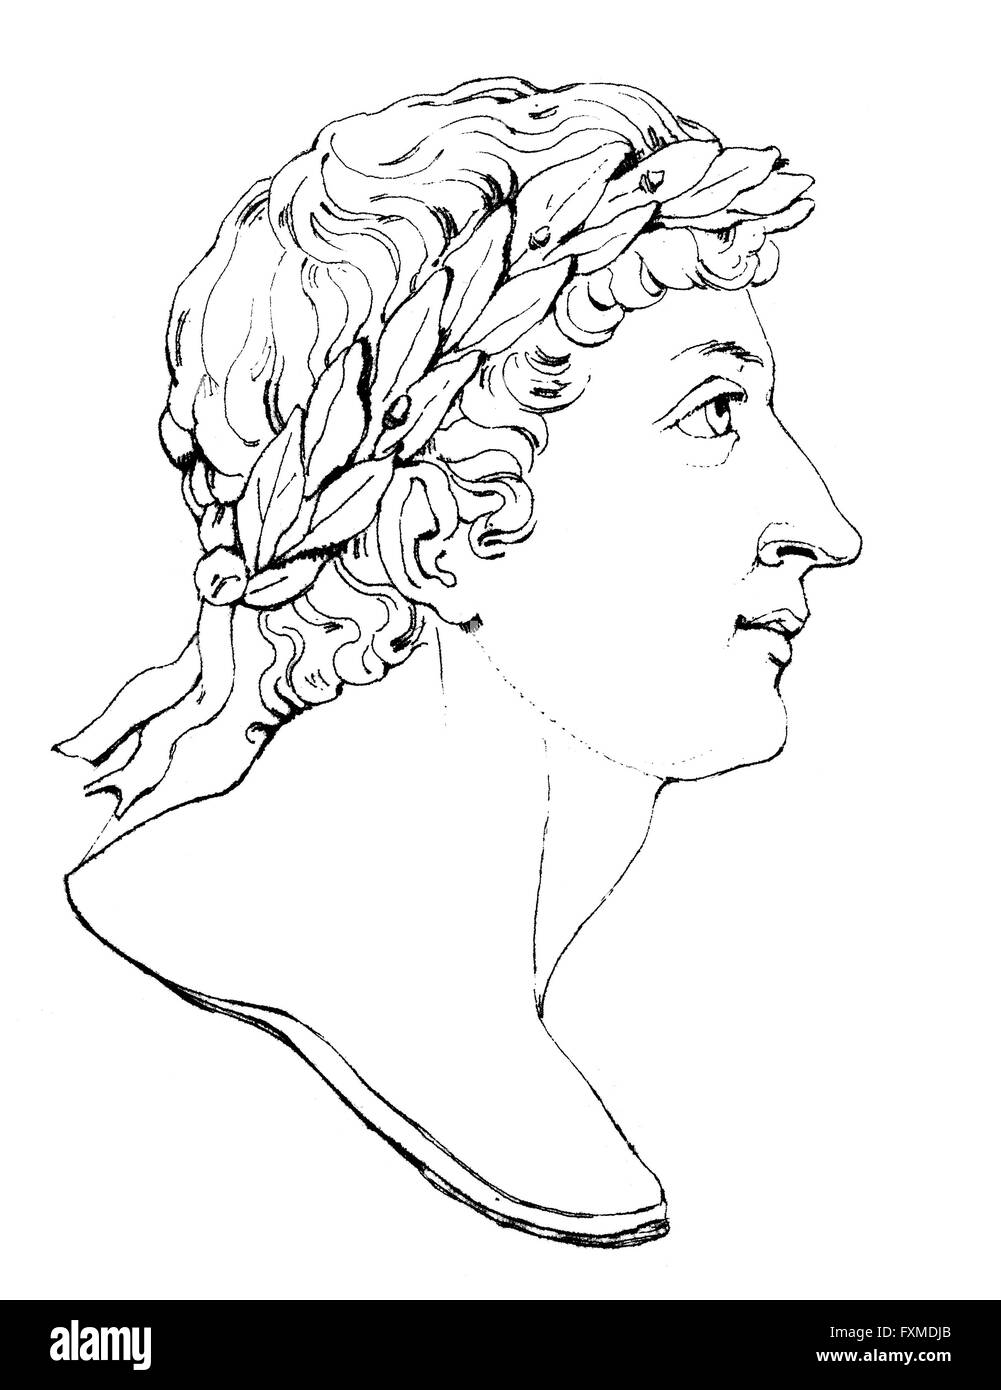 Publius Ovidius Naso or Ovid, 43 BC - 17, a Roman poet, Publius Ovidius Naso oder Ovid, 43 v. Chr. - 17 n. Chr., - Stock Image